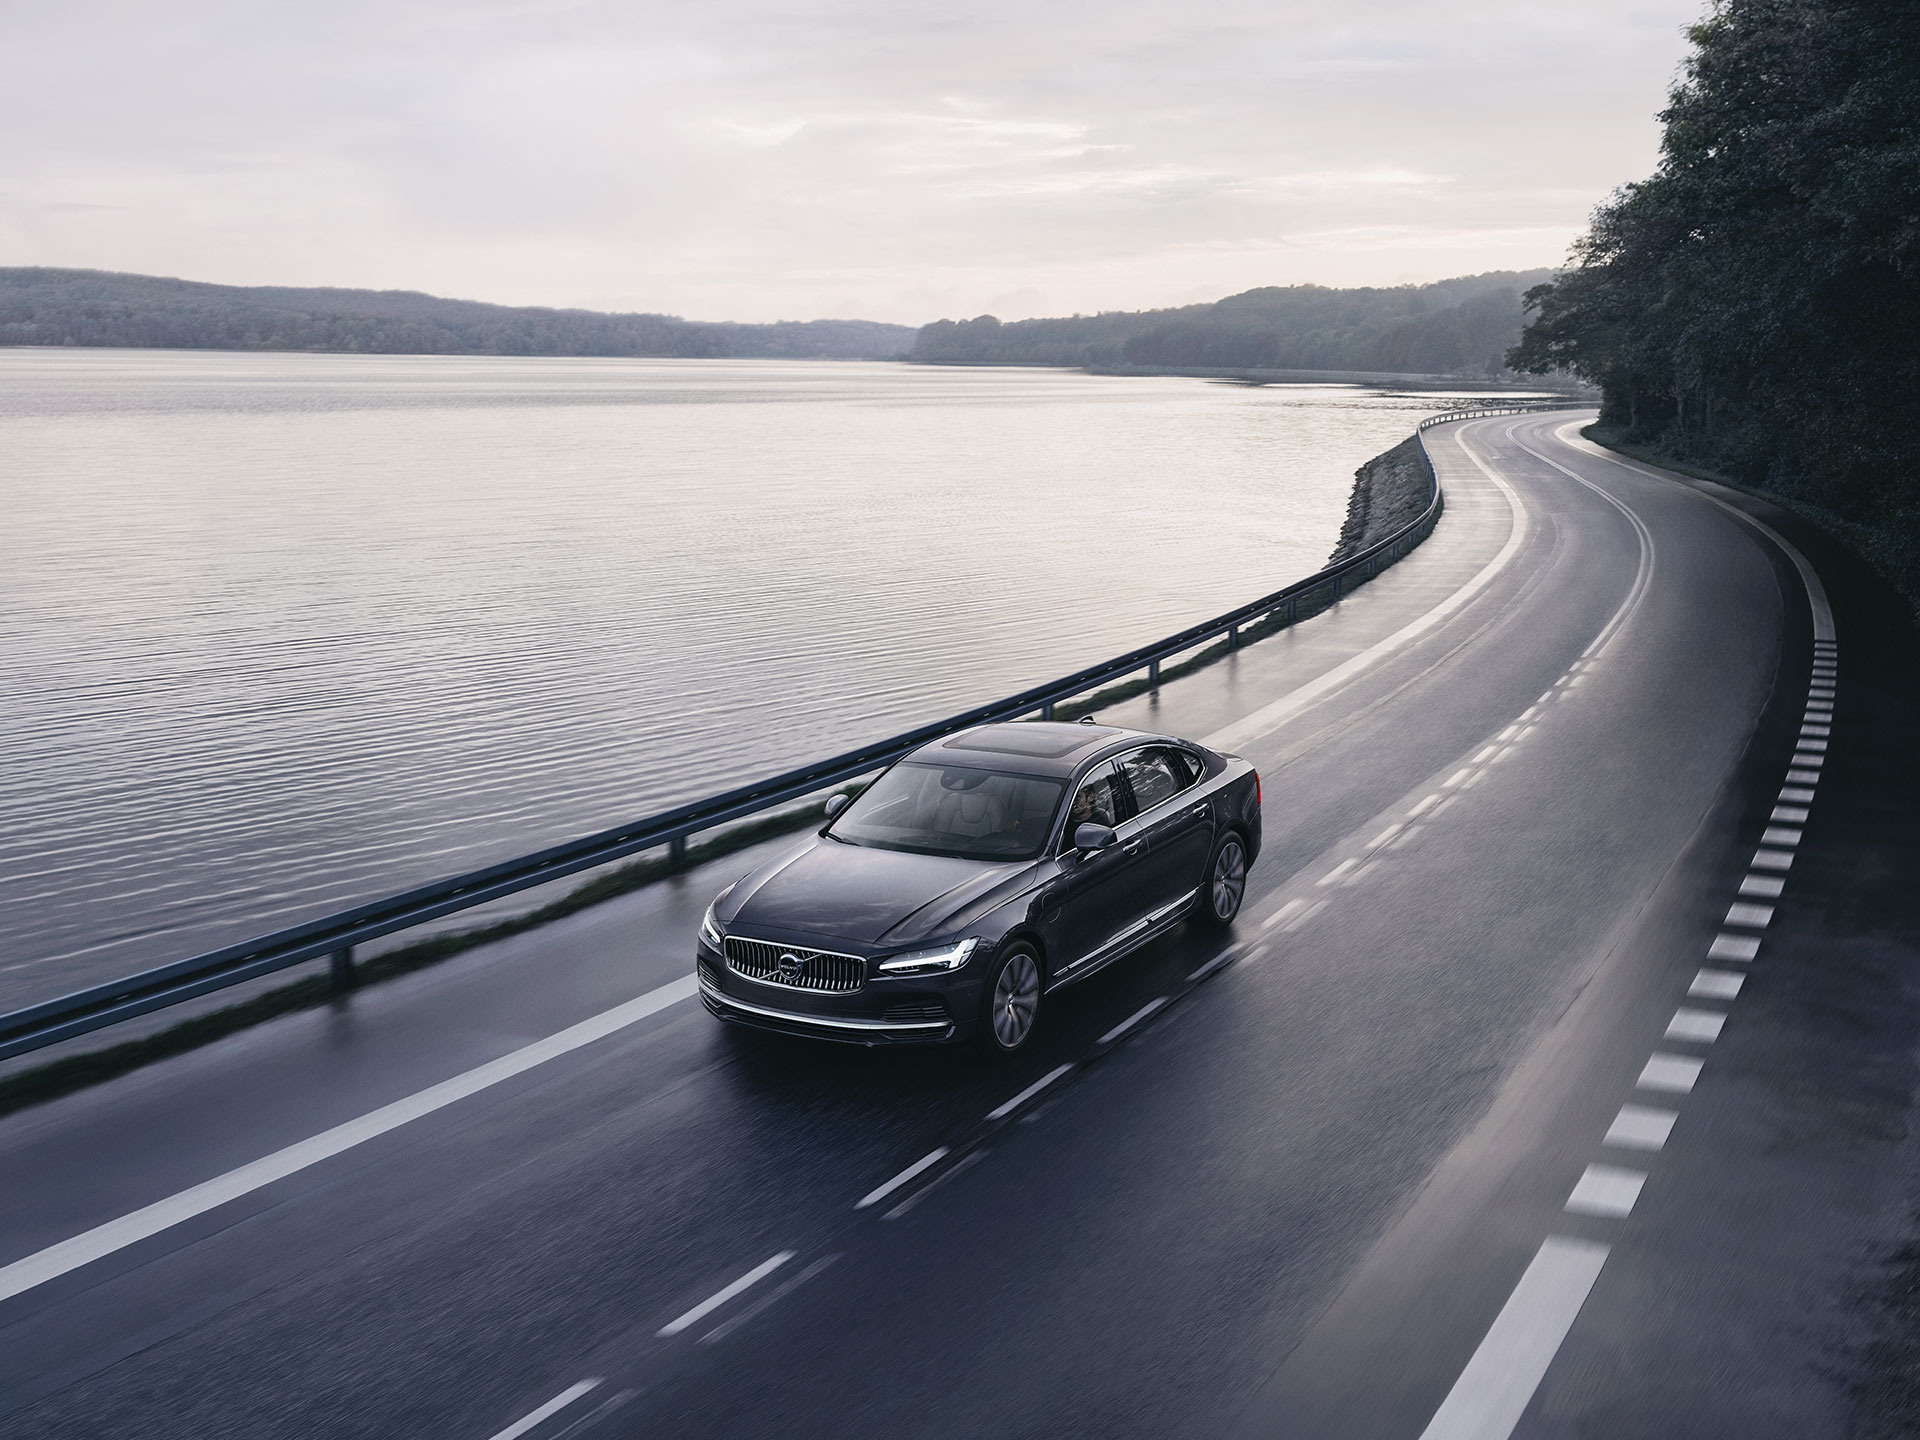 A Volvo S90 mild hybrid driving on a coastal road.